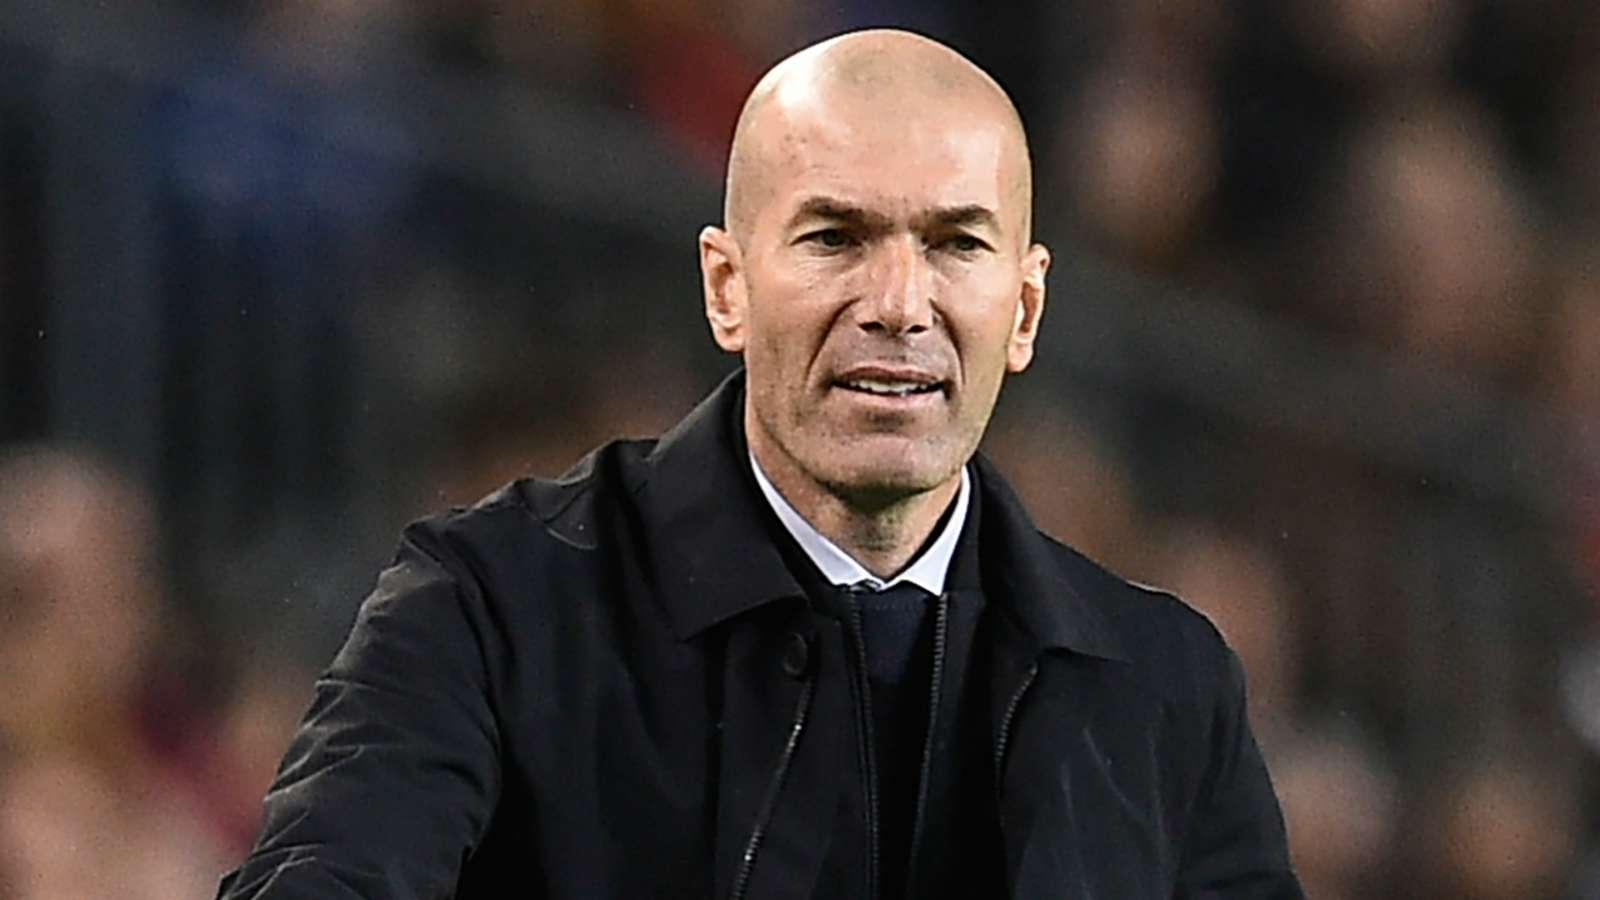 zinedine-zidane-real-madrid-2019-20